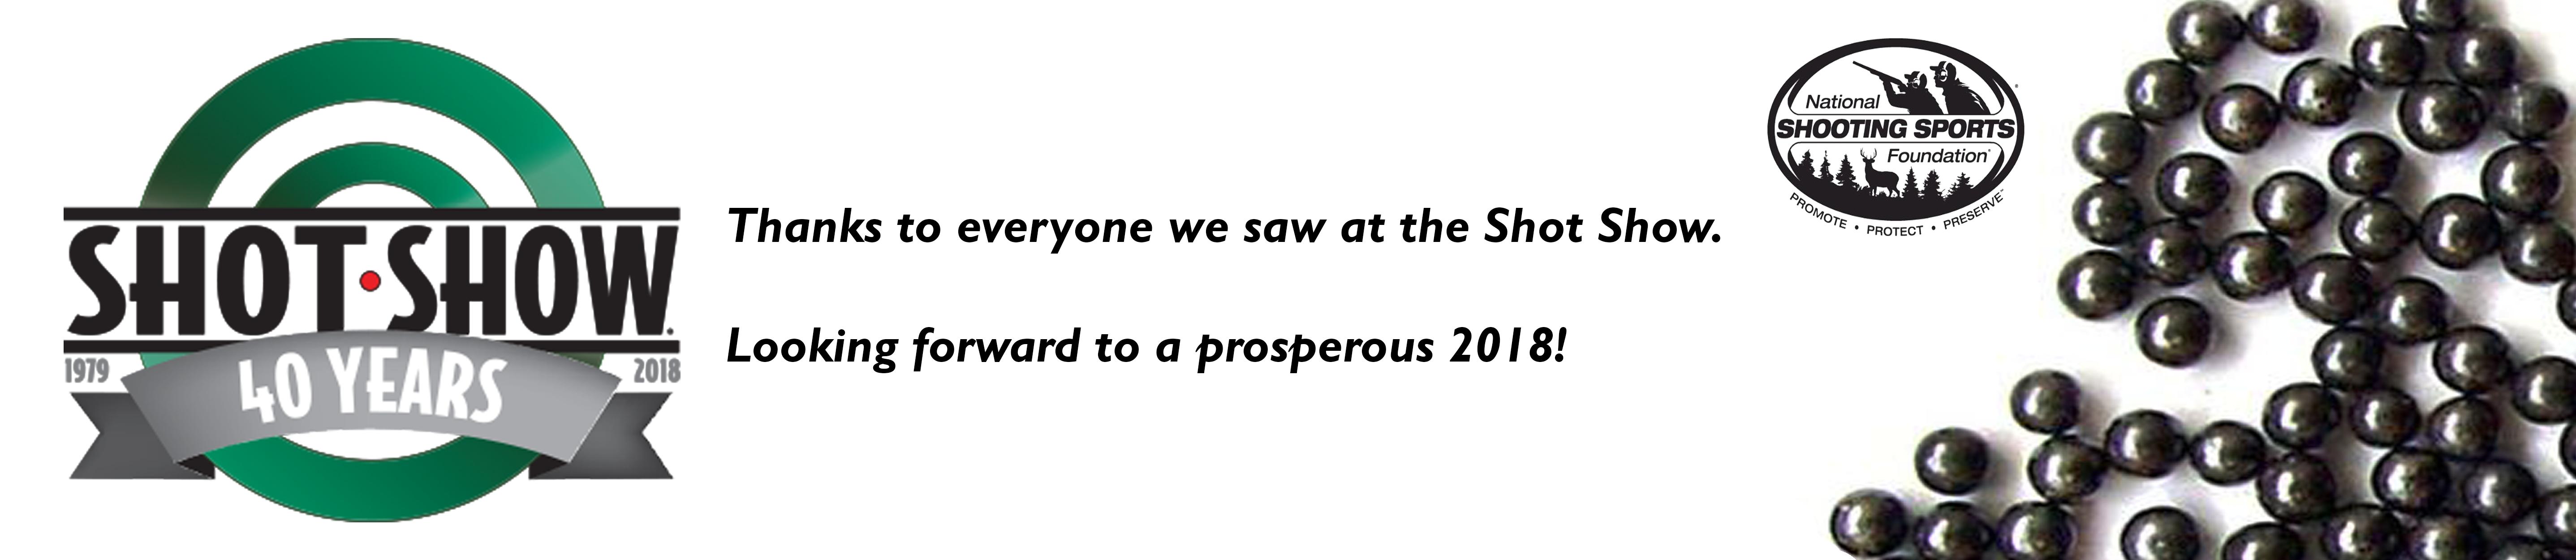 Shot Show Thanks